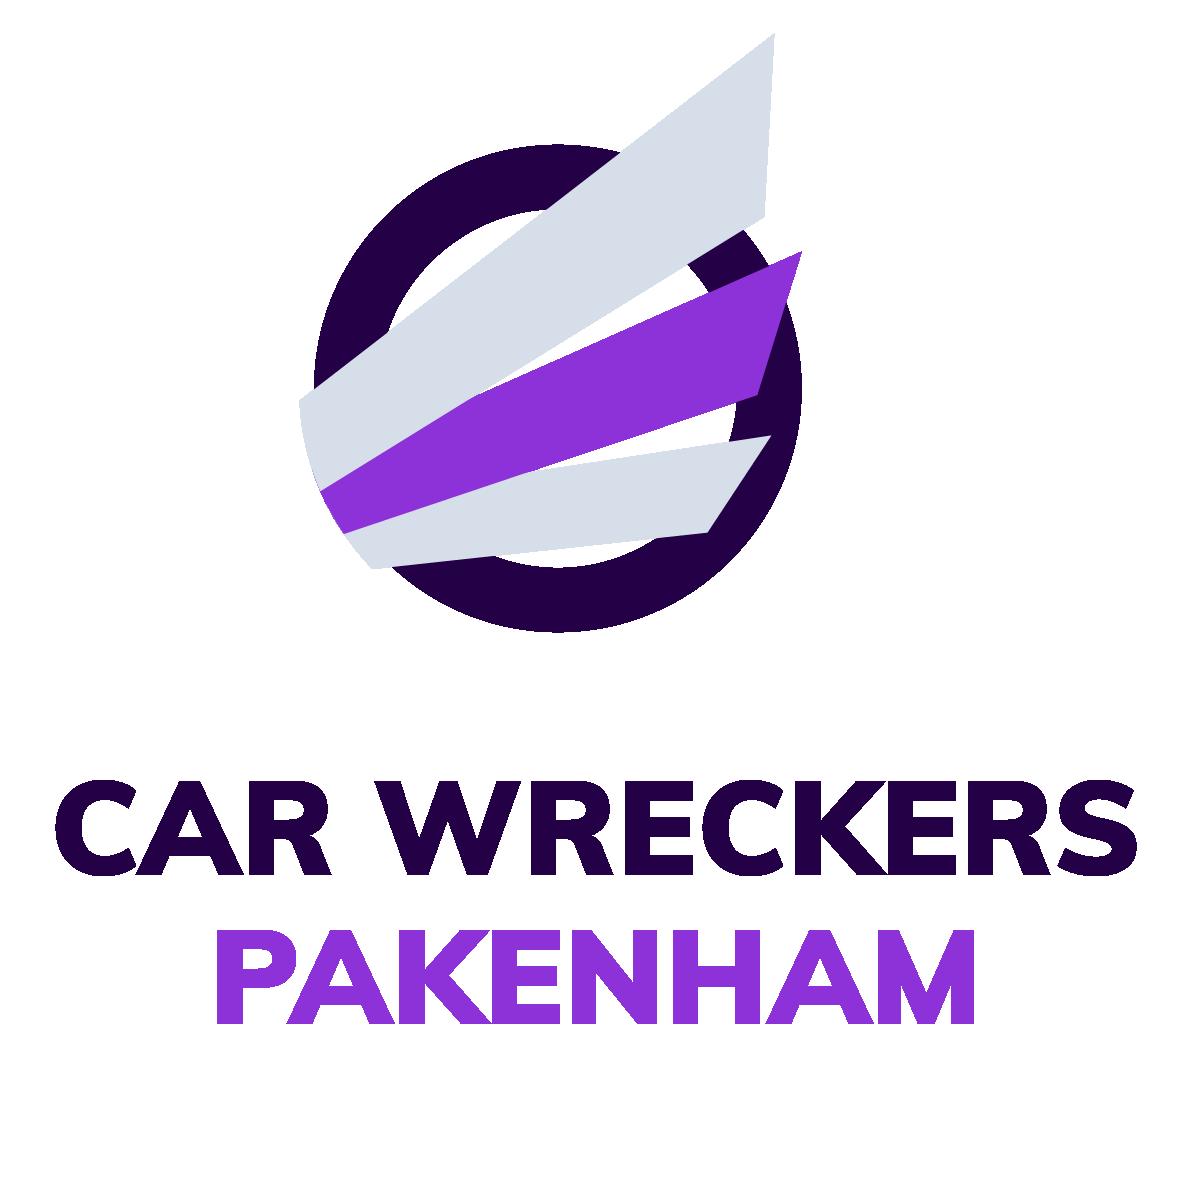 Car Wreckers Pakenham